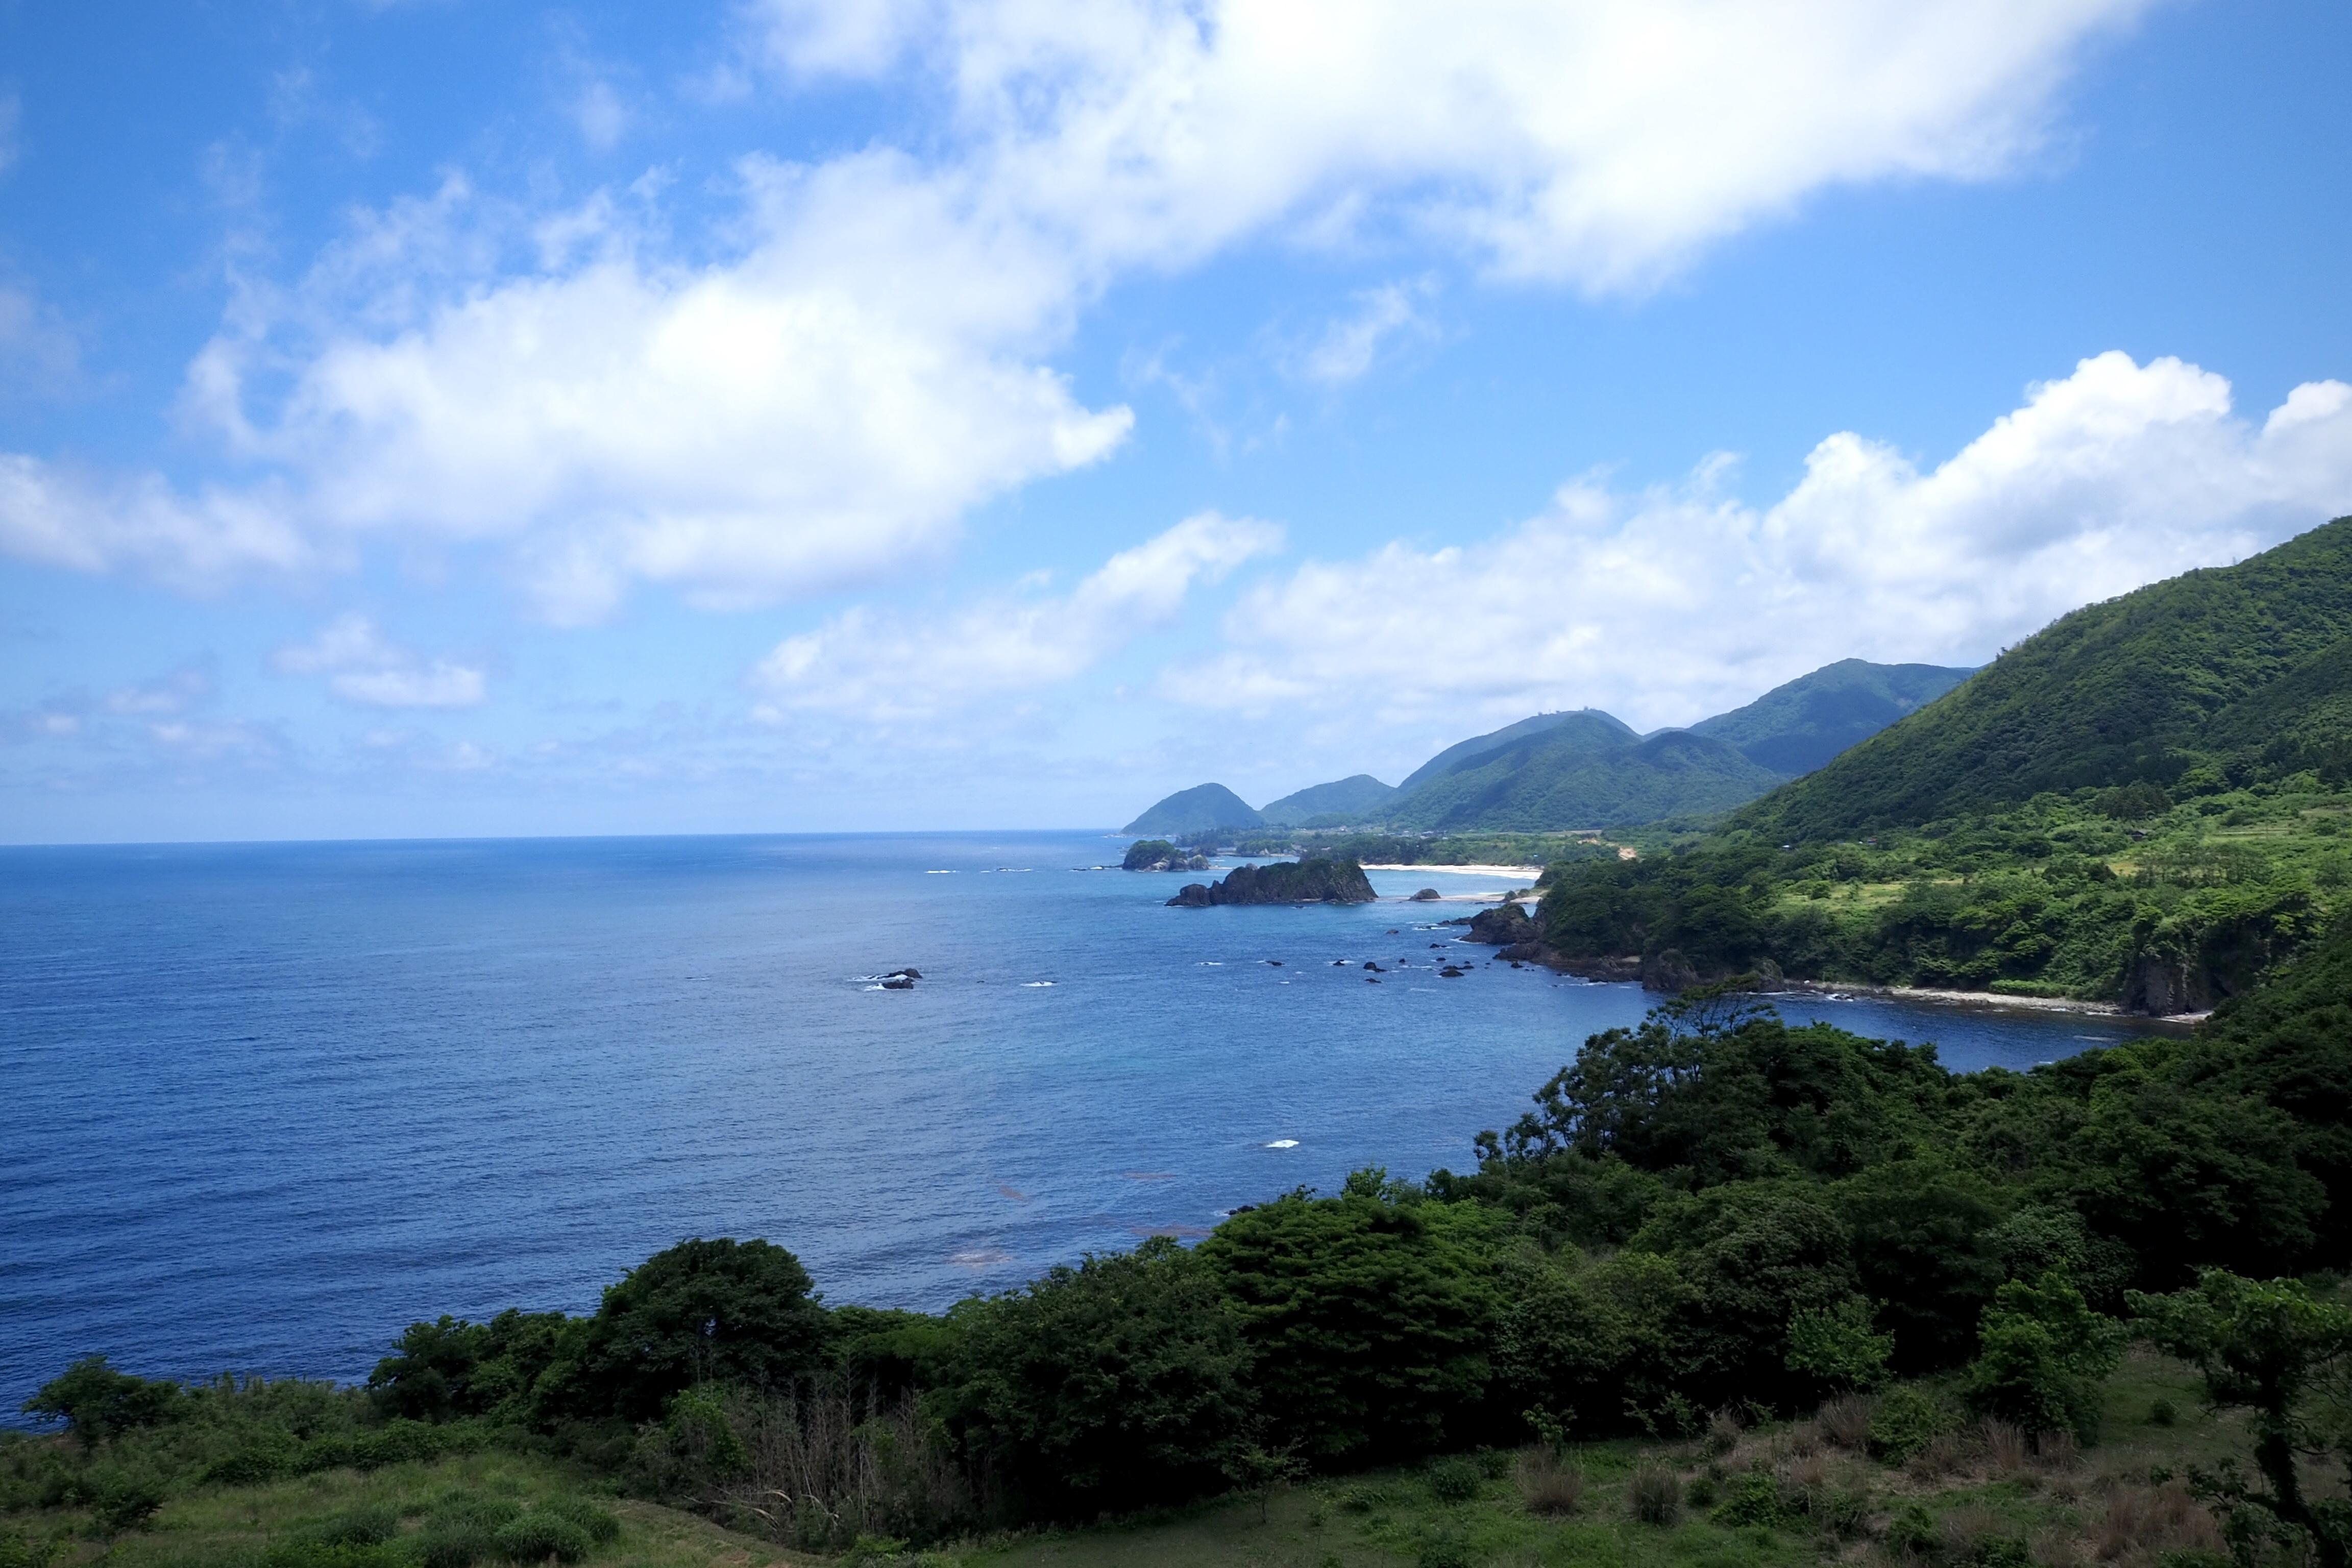 harleydavidson-motorcycle-touring-blog-kyoto-tanngopeninsula-tangomatushima.jpg